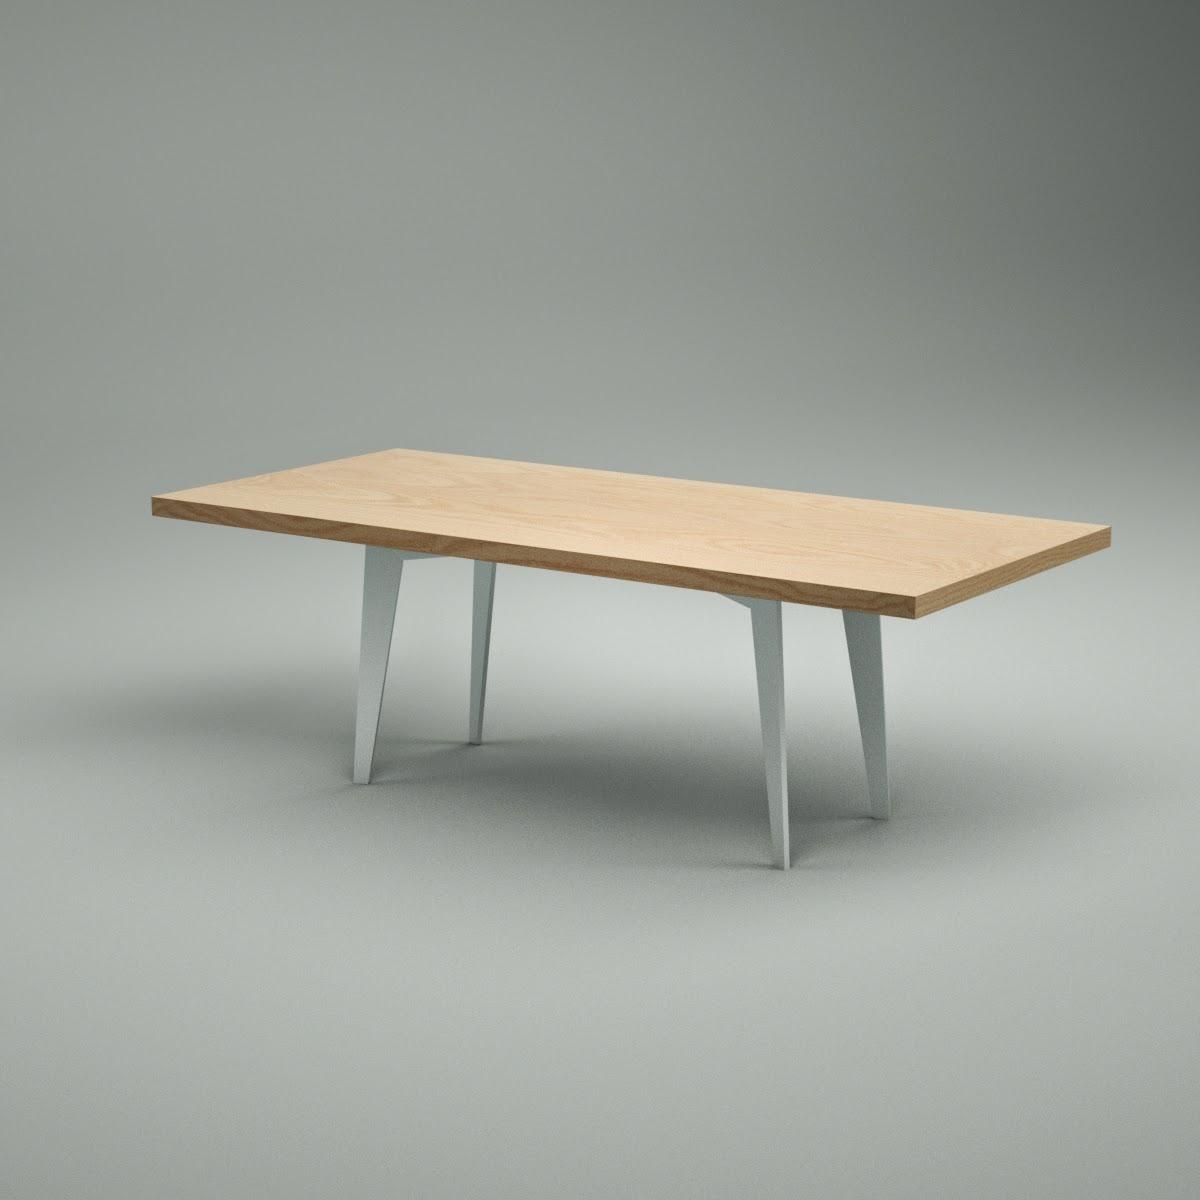 Tango Table 3D Model Download fbx obj dxf blend